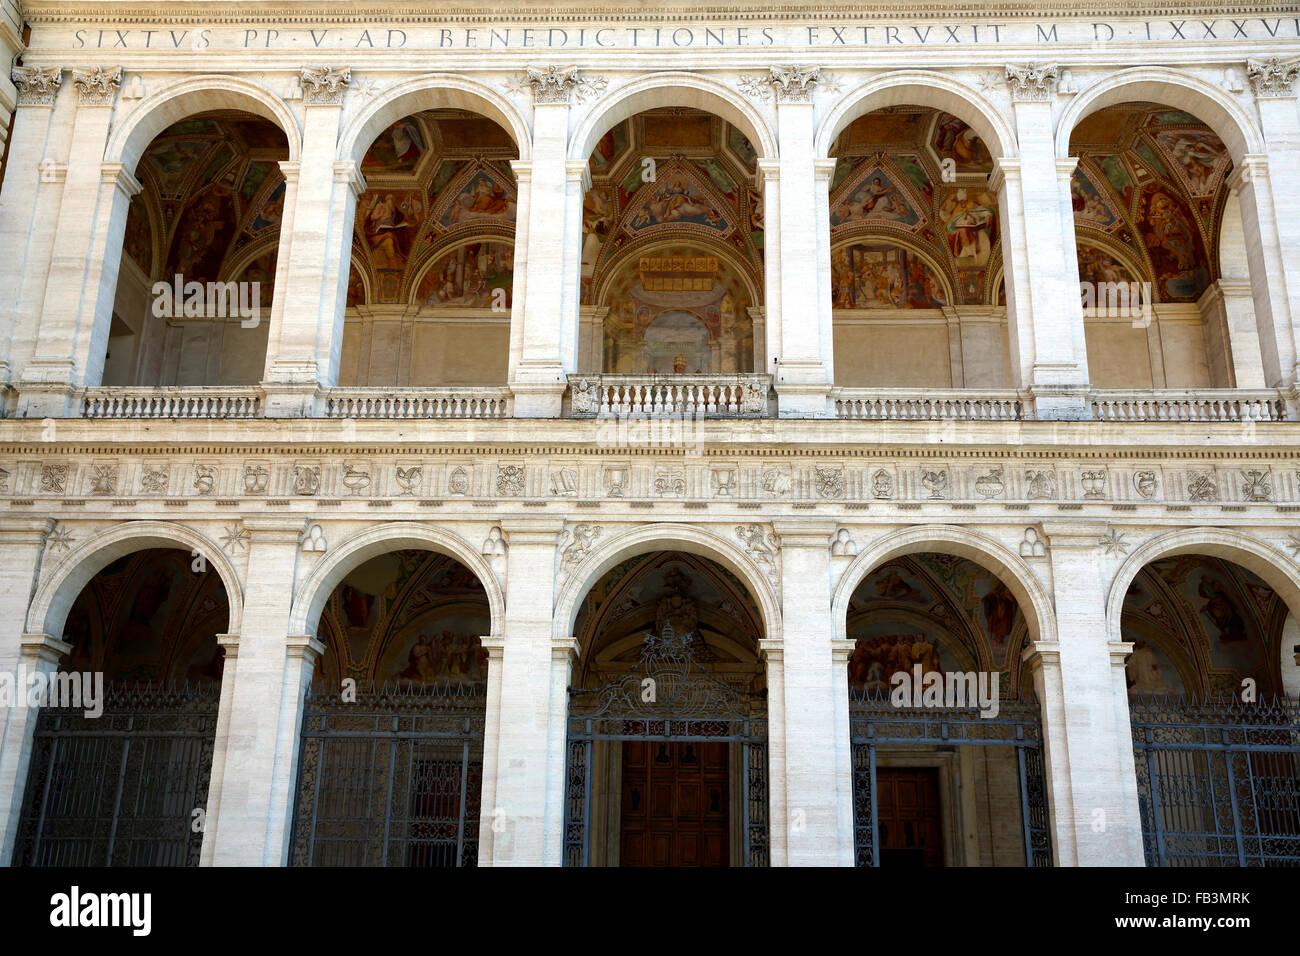 The portico of Saint John Lateran Basilica in Rome. - Stock Image